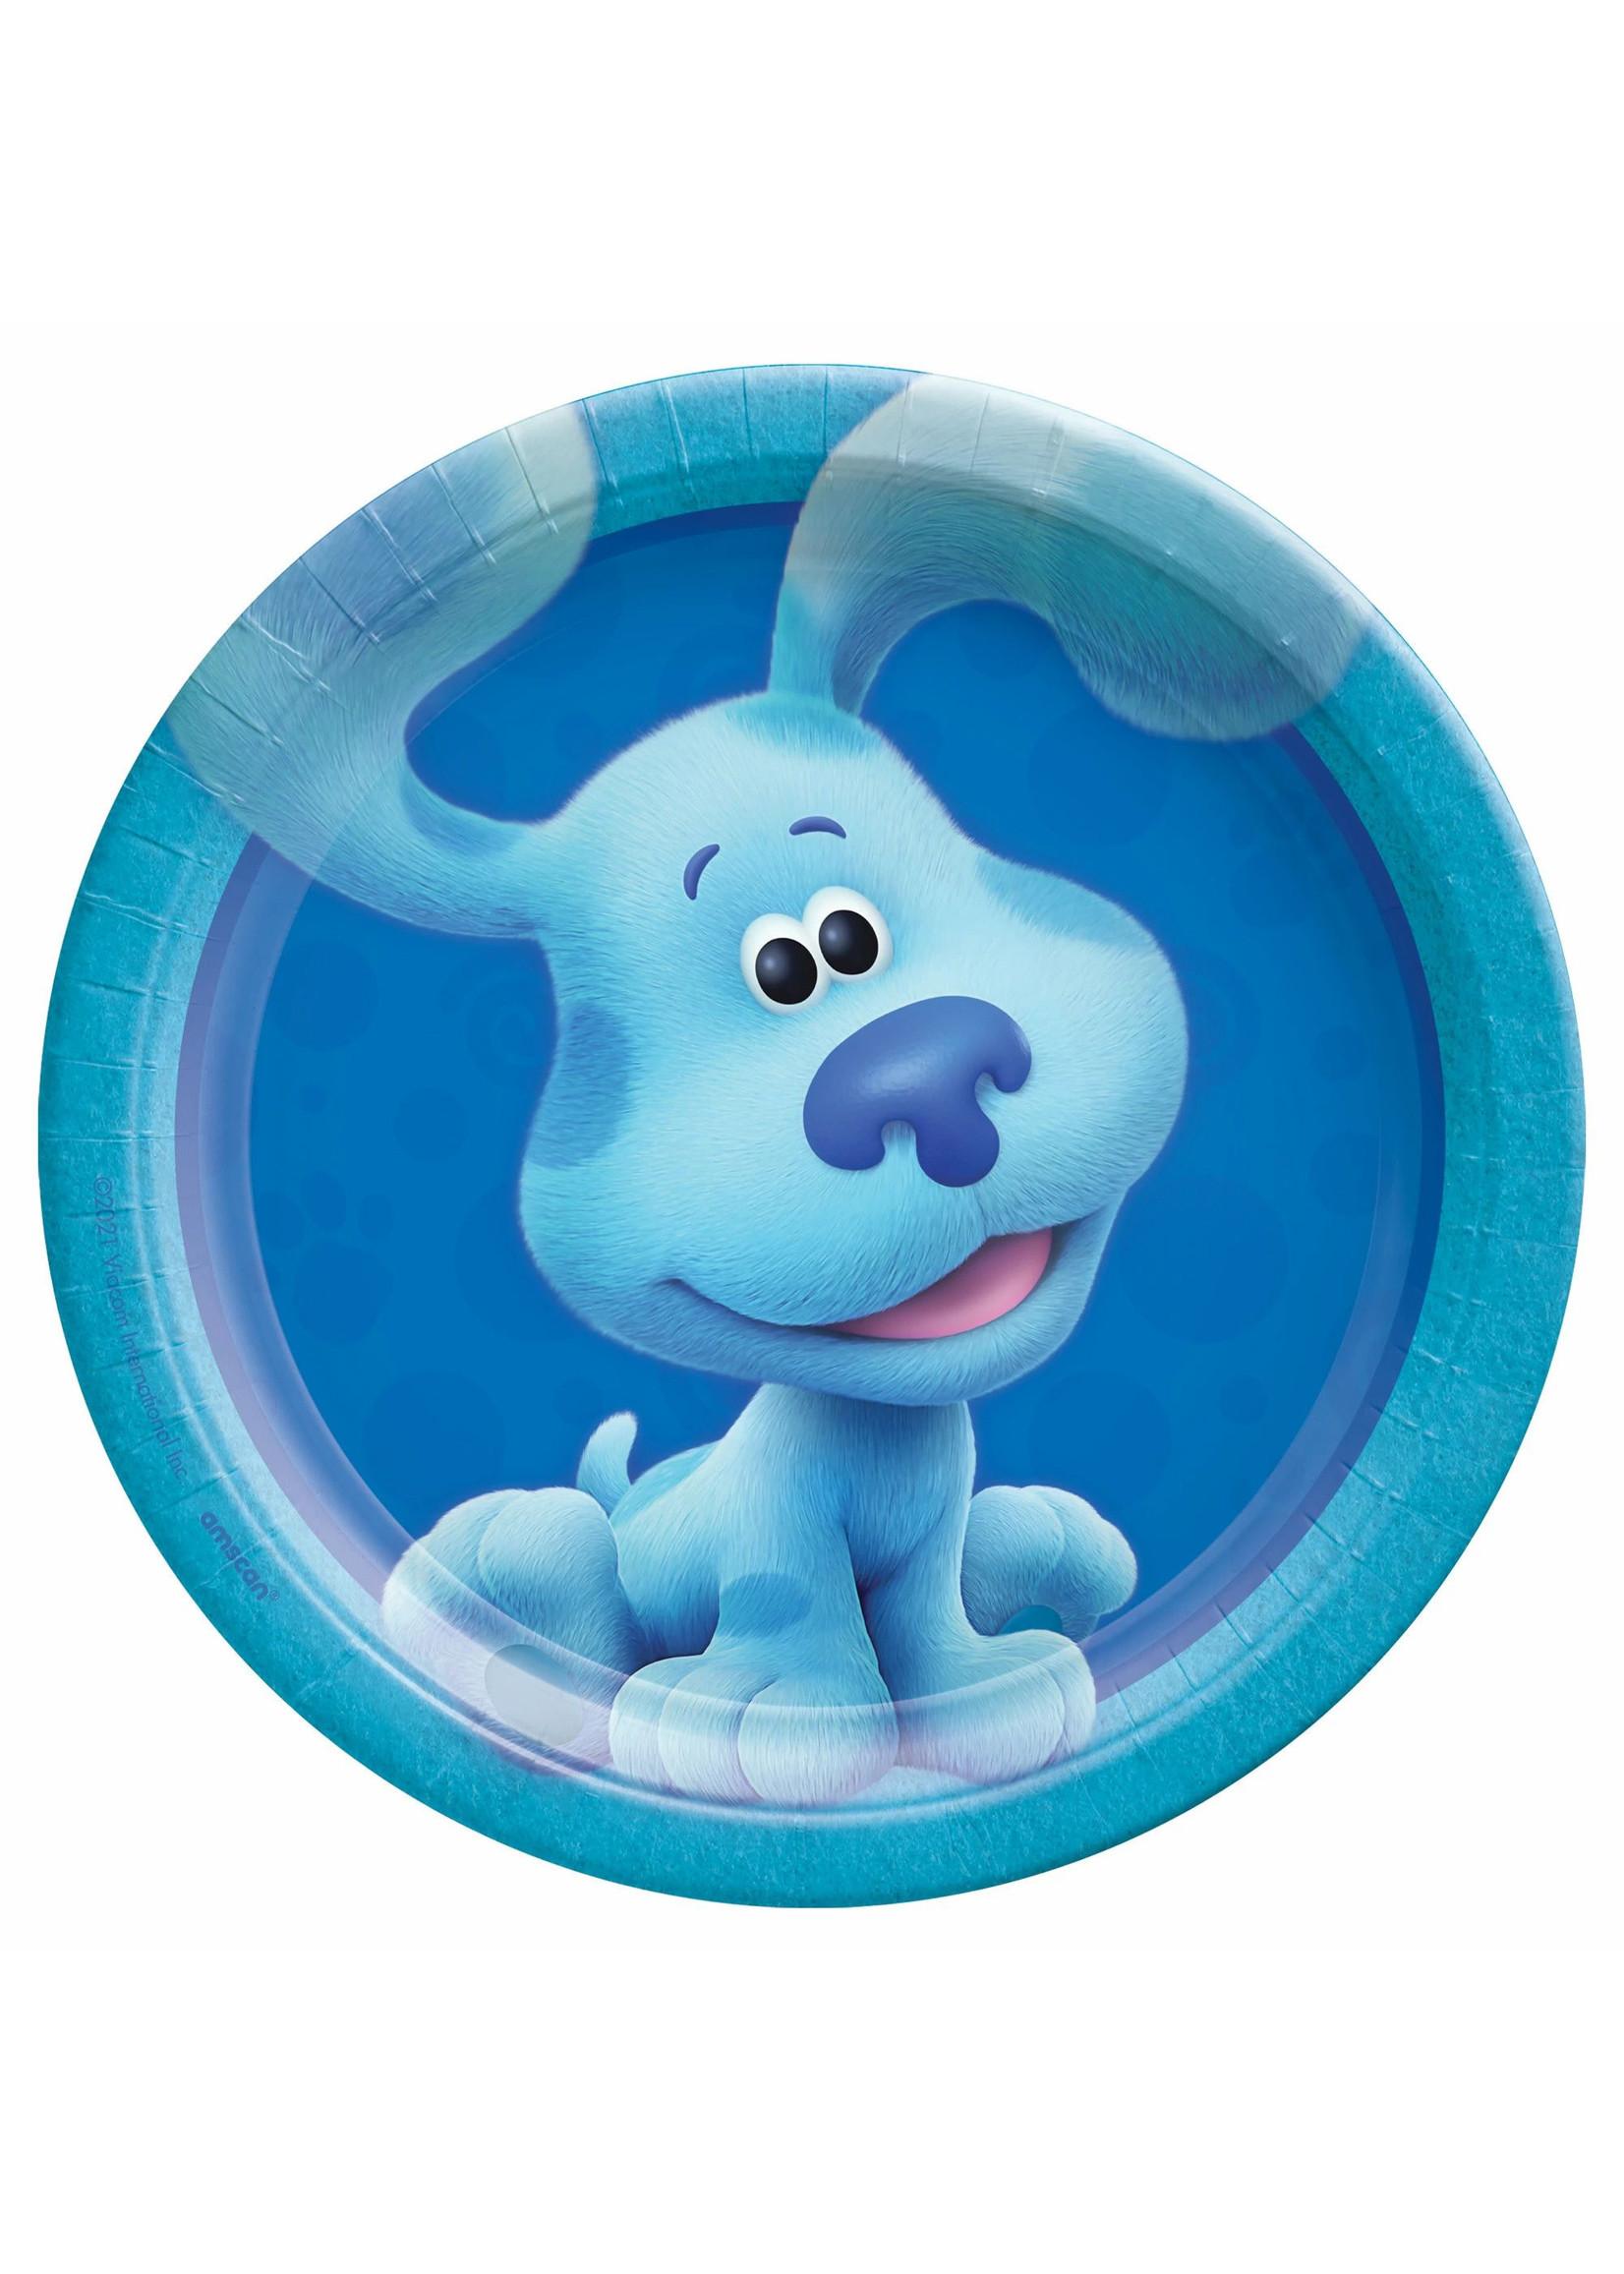 "Blues Clues 7"" Round Plates - Blue - 8ct"